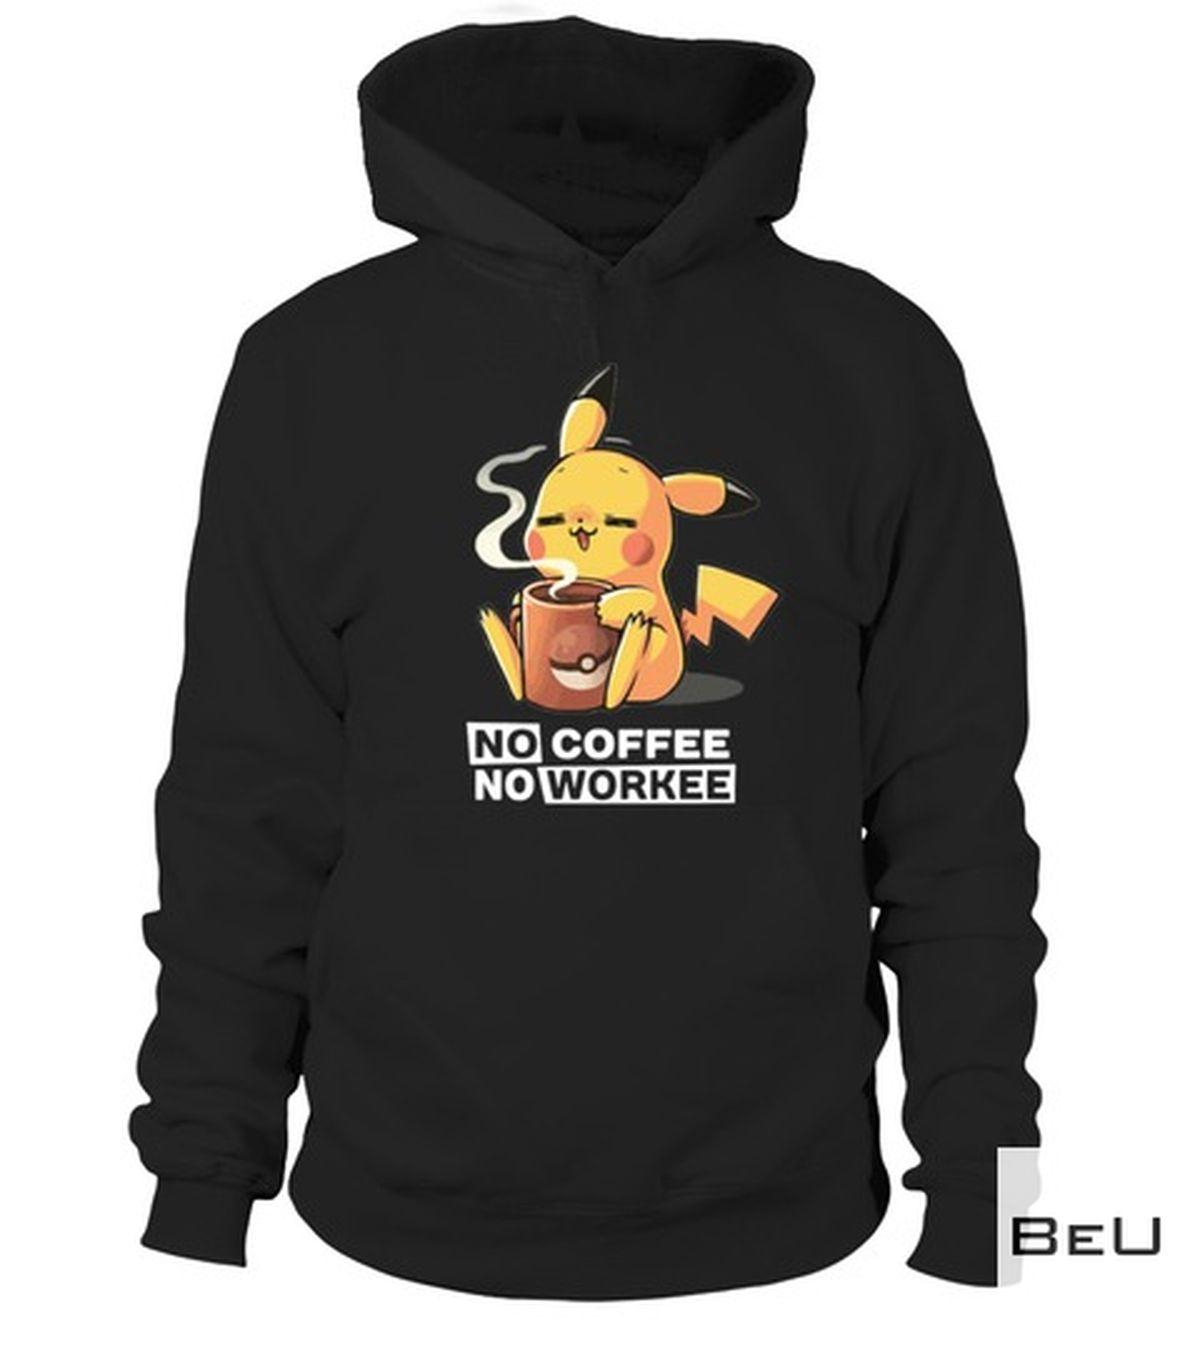 Fast Shipping Pokemon Pikachu No Coffee No Workee Shirt, hoodie, tank top